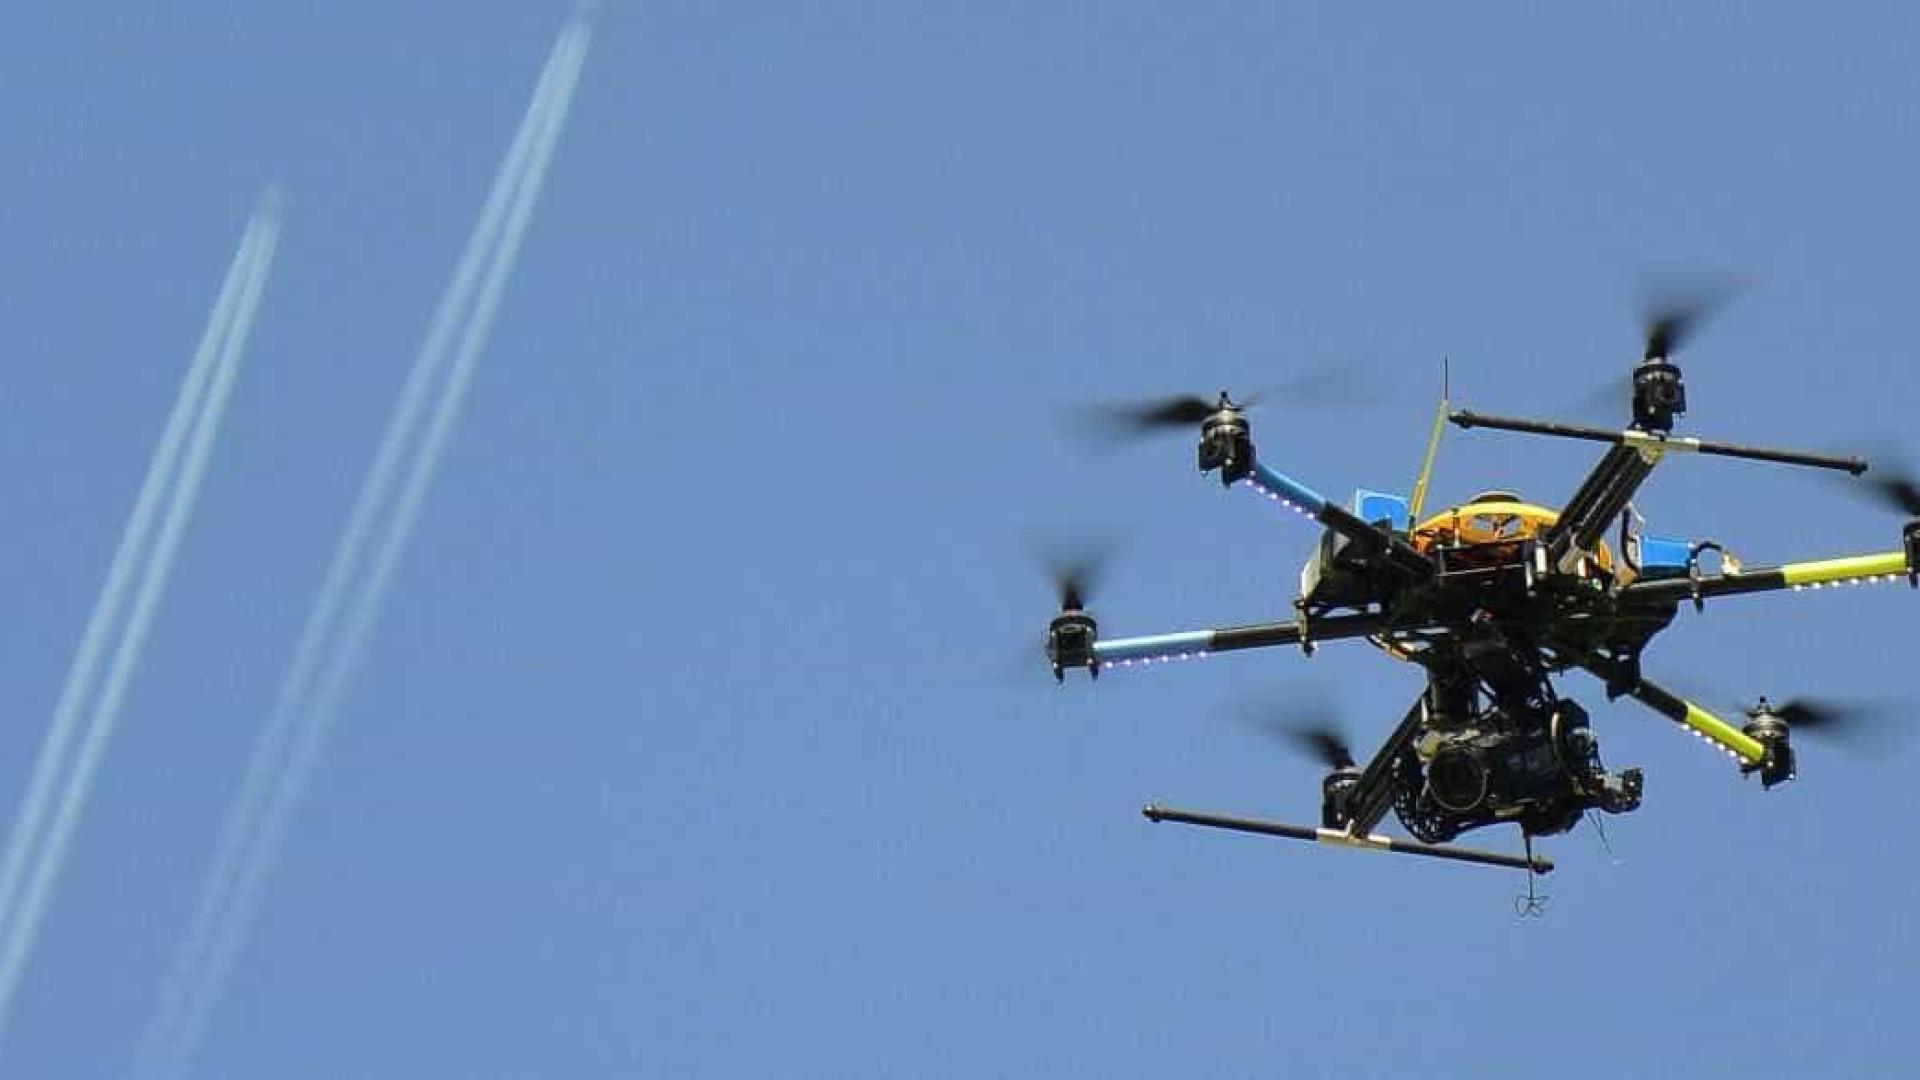 E-commerce chinesa usa drones  para entregar encomendas